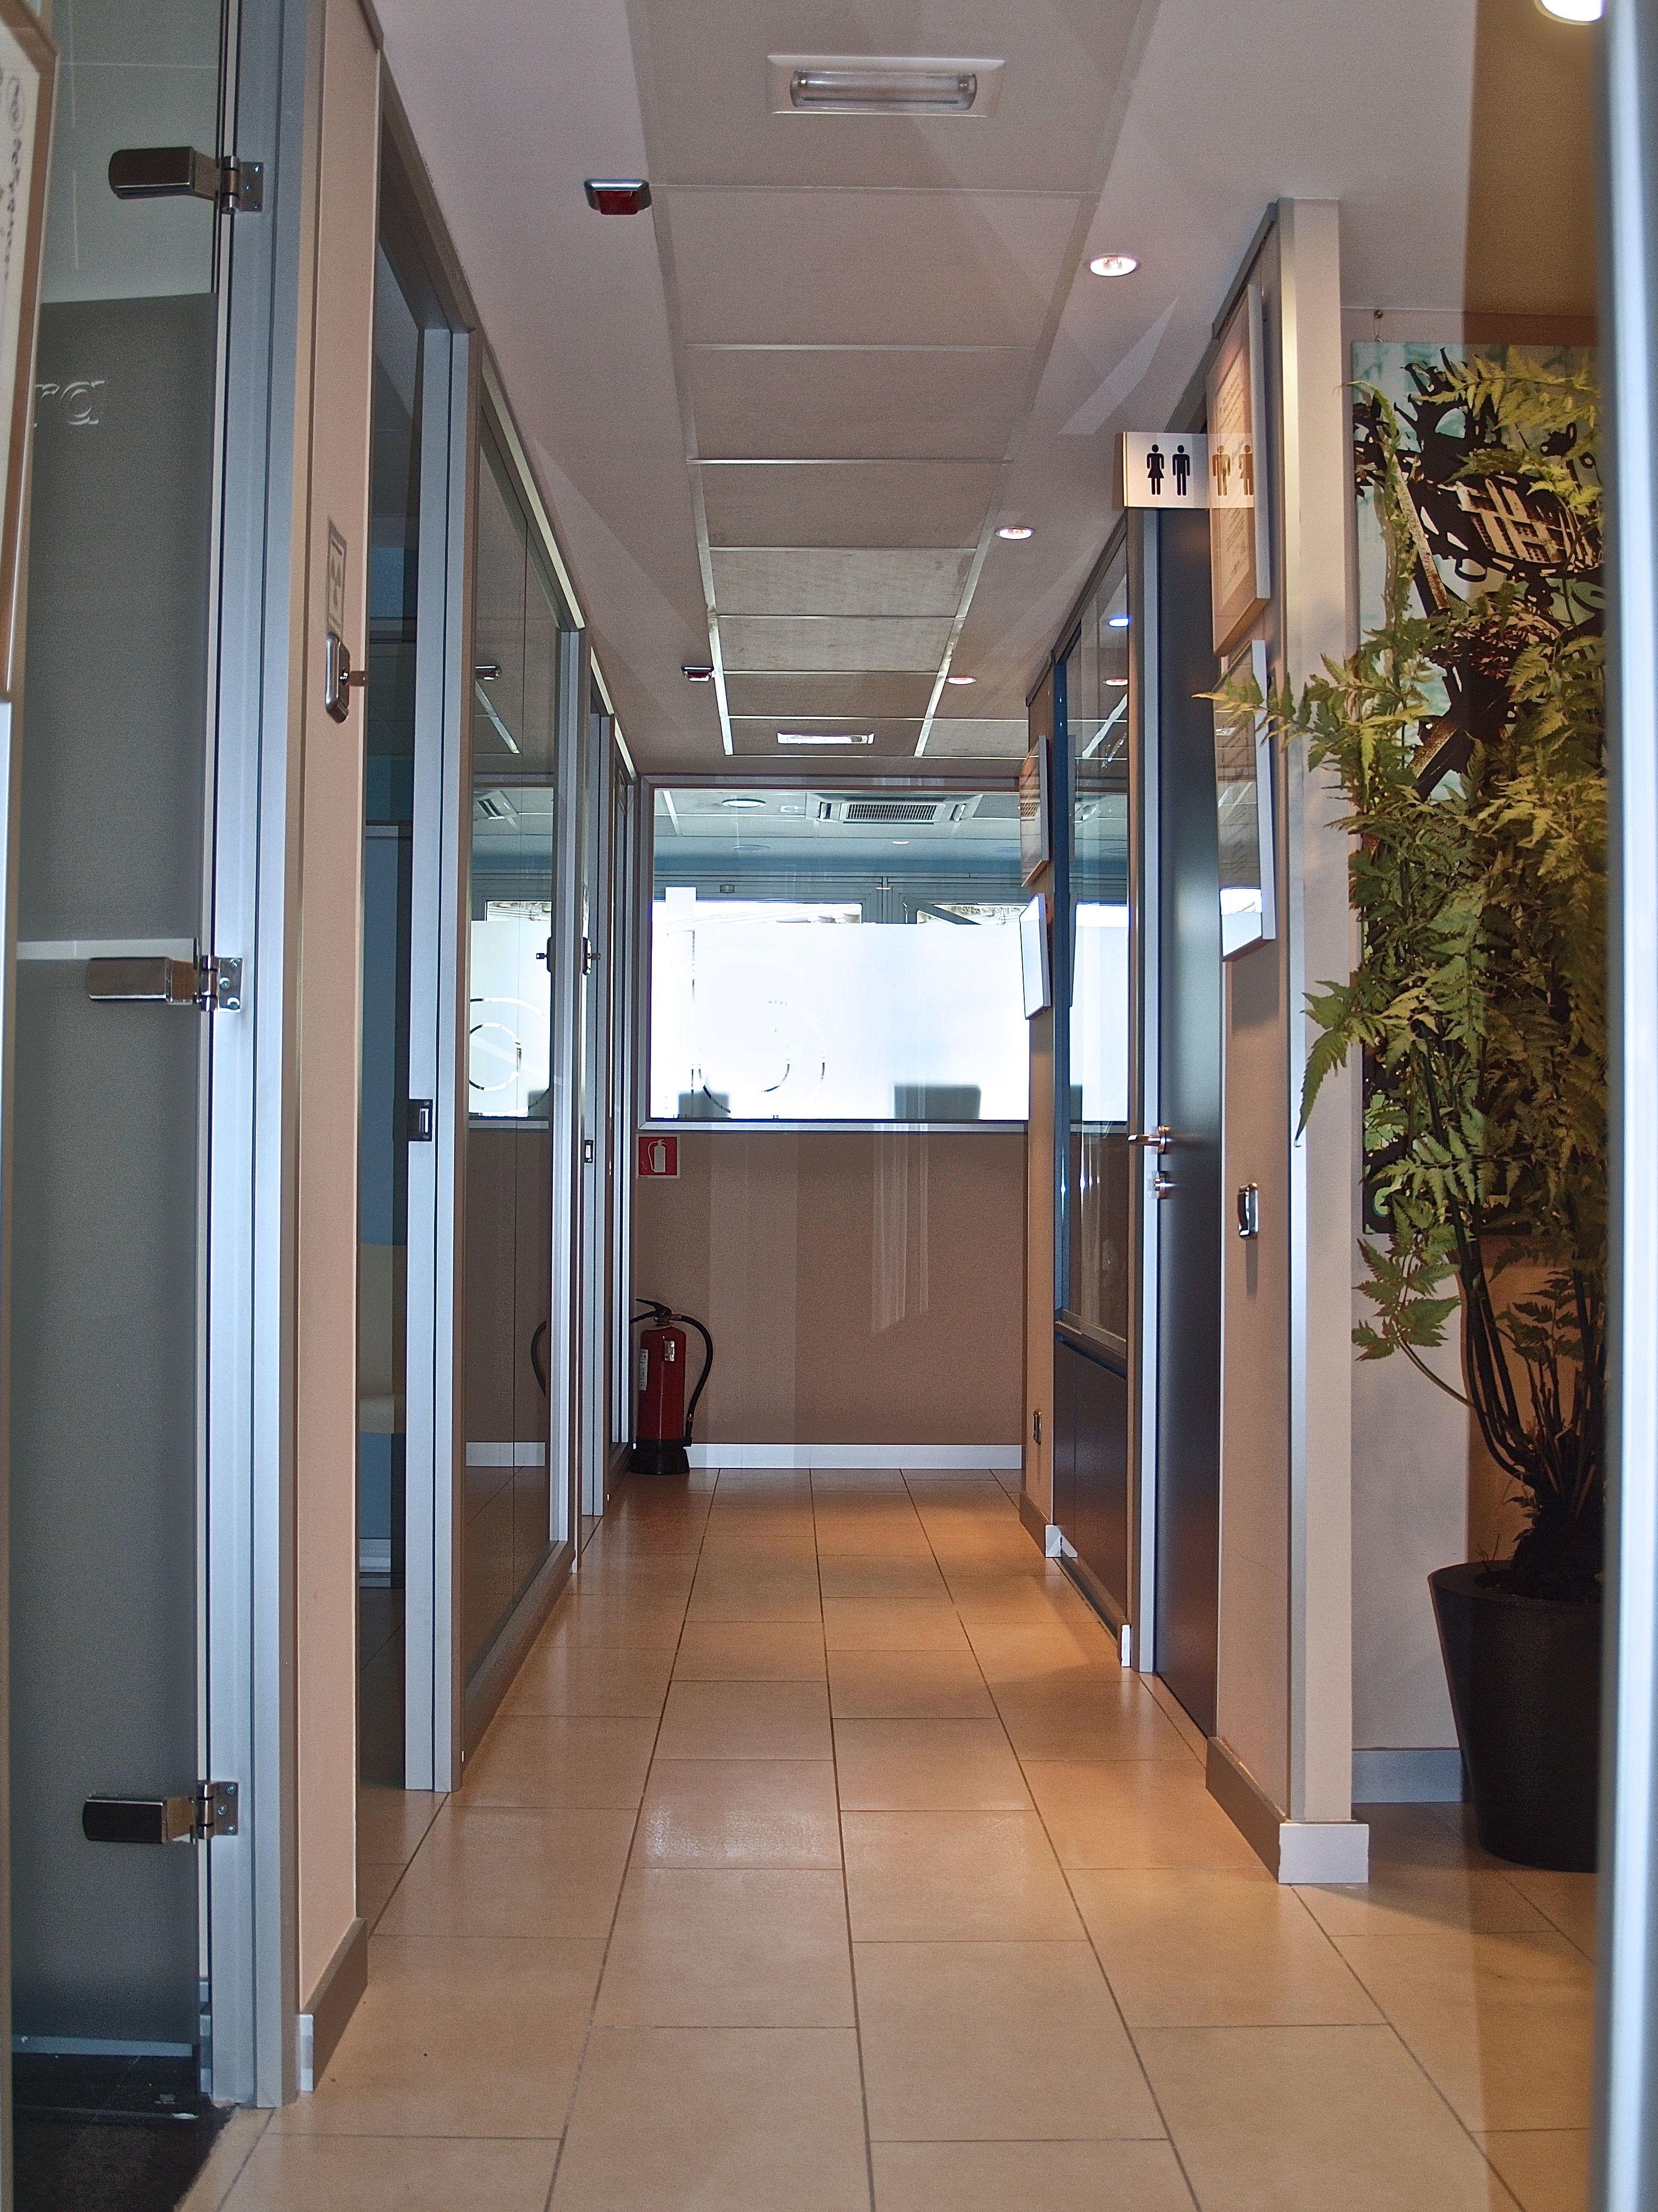 Foto 5 de Clínica dental en Barcelona en Barcelona | IOIB